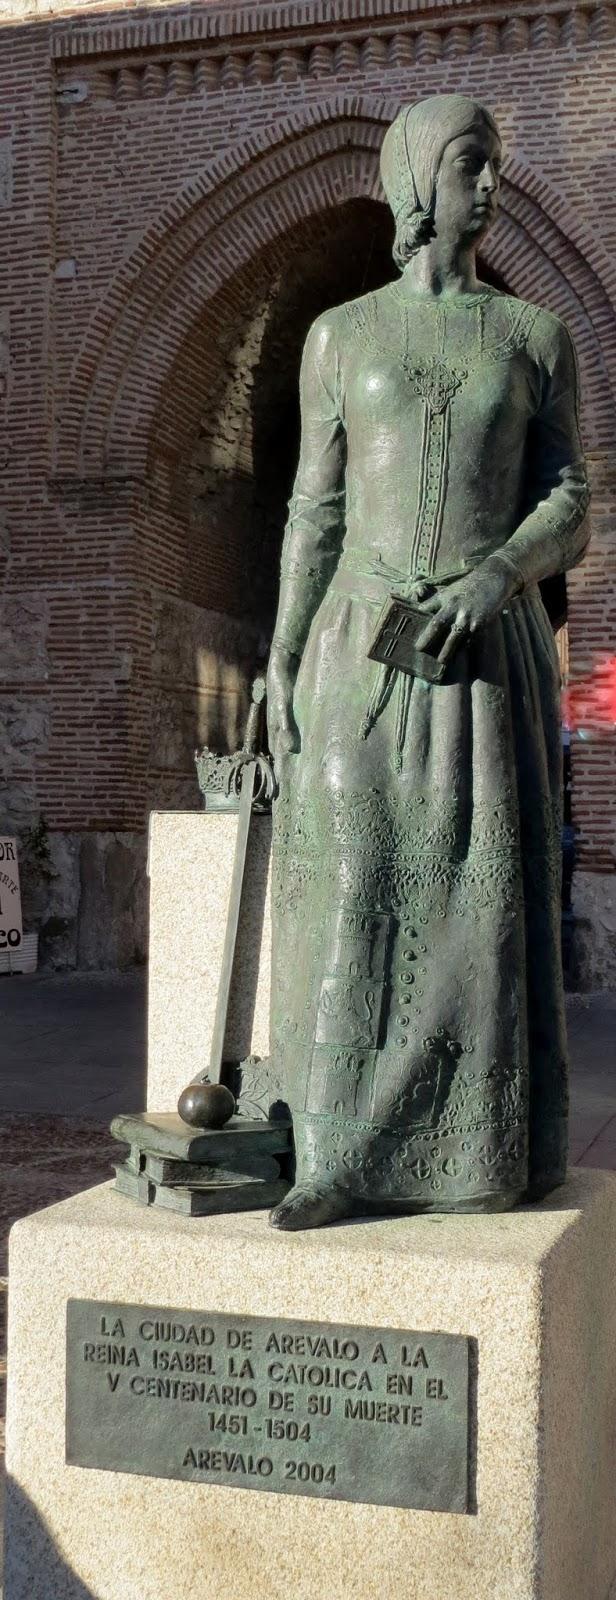 La Ruta de Isabel. Arévalo. Monumento Reina Isabel de Castilla